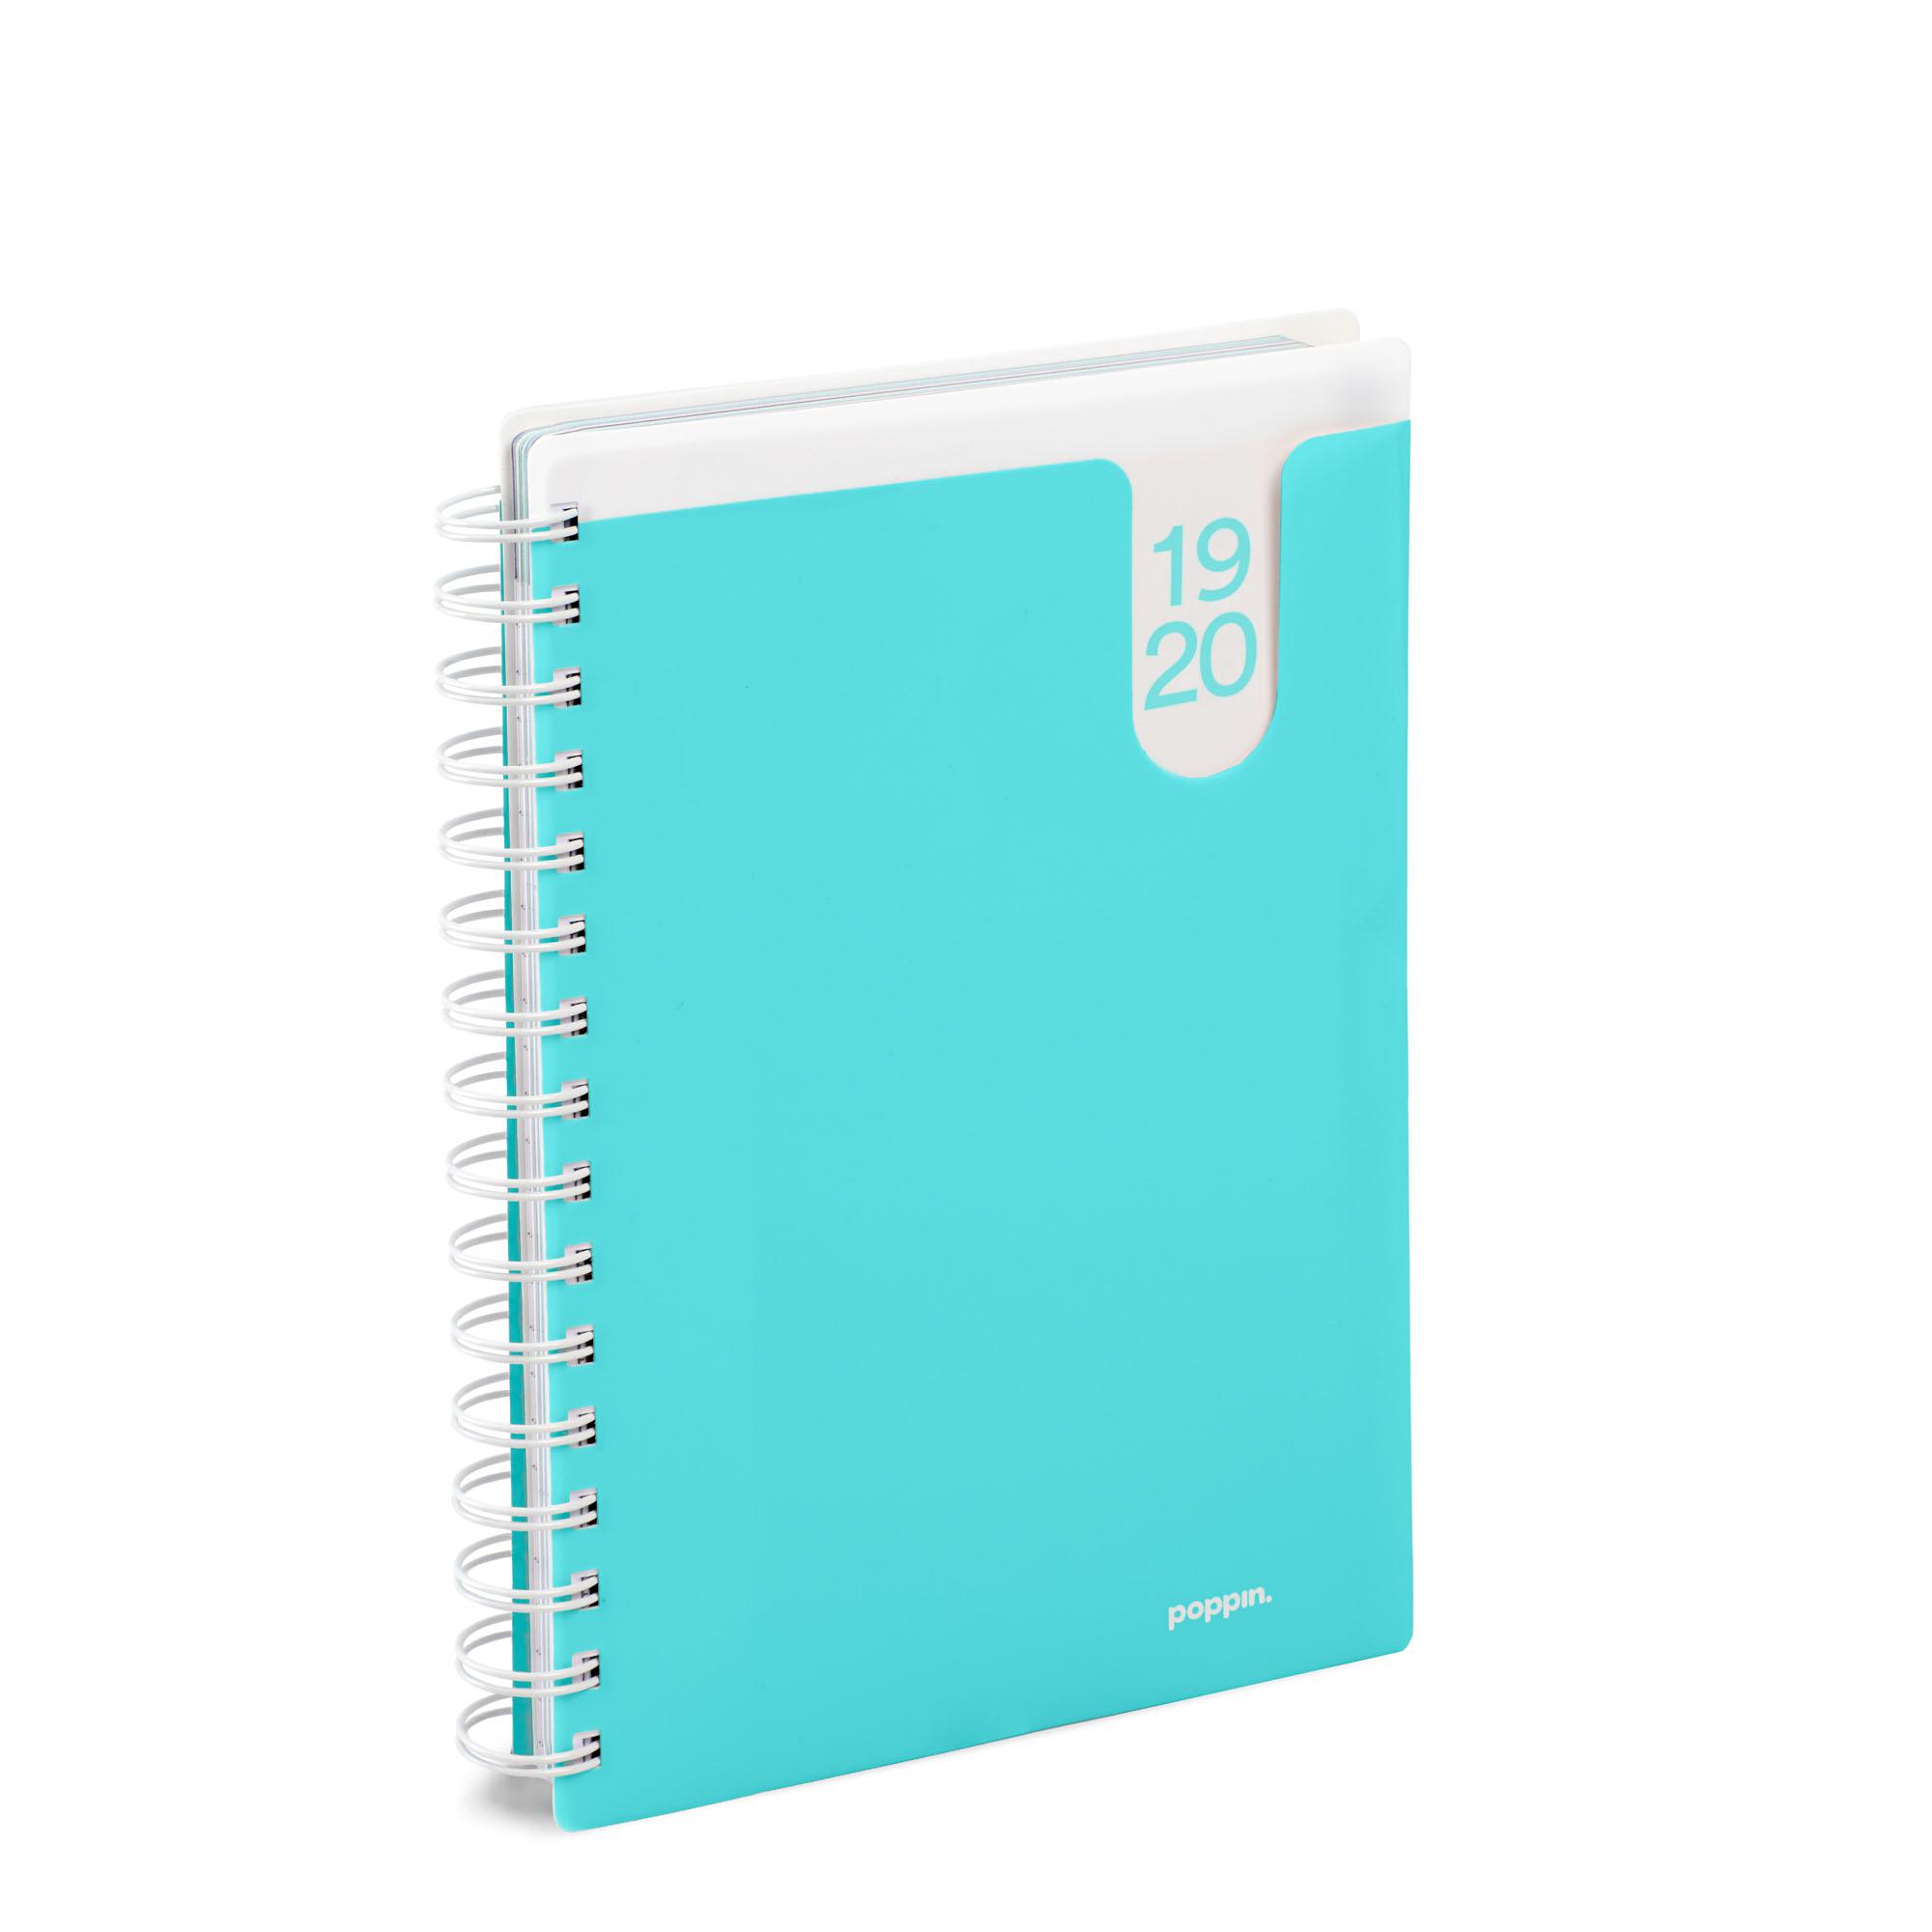 Medium 18-Month Pocket Book Planner 2019-2020